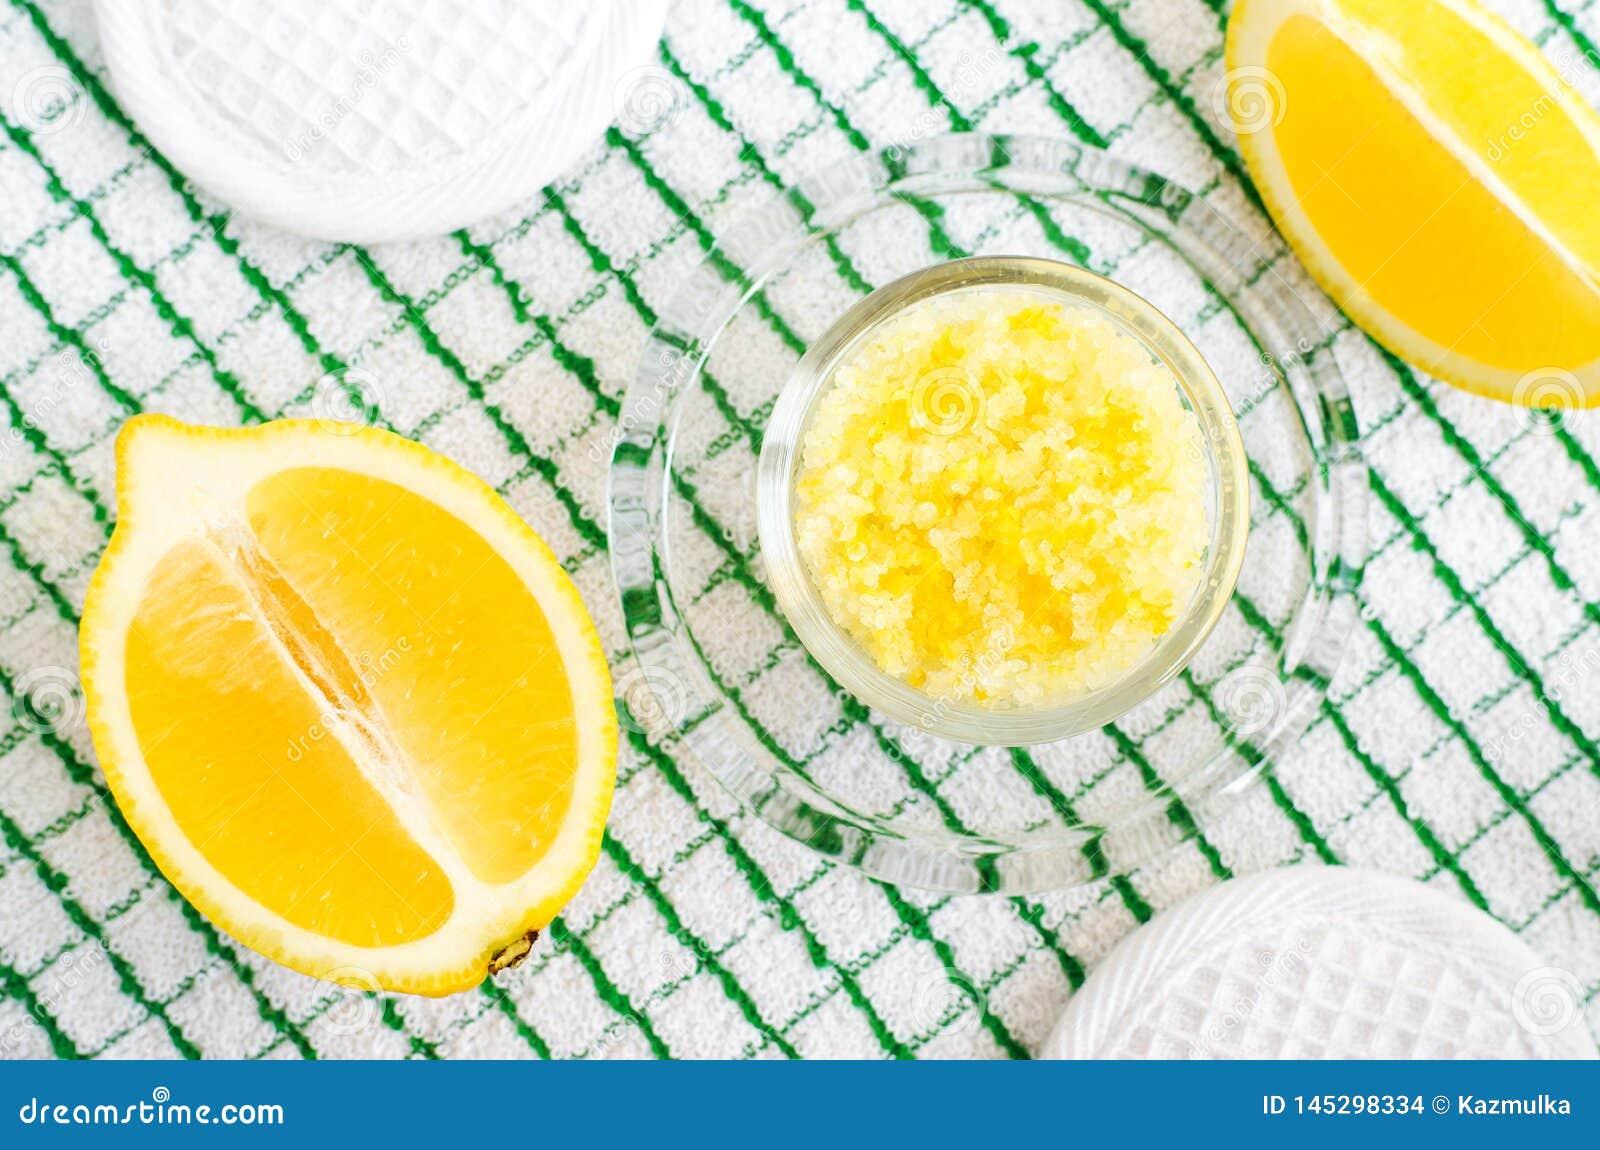 Homemade scrub foot soak or bath salt with lemon juice and zest, sea salt and olive oil. DIY beauty treatments and spa recipe.